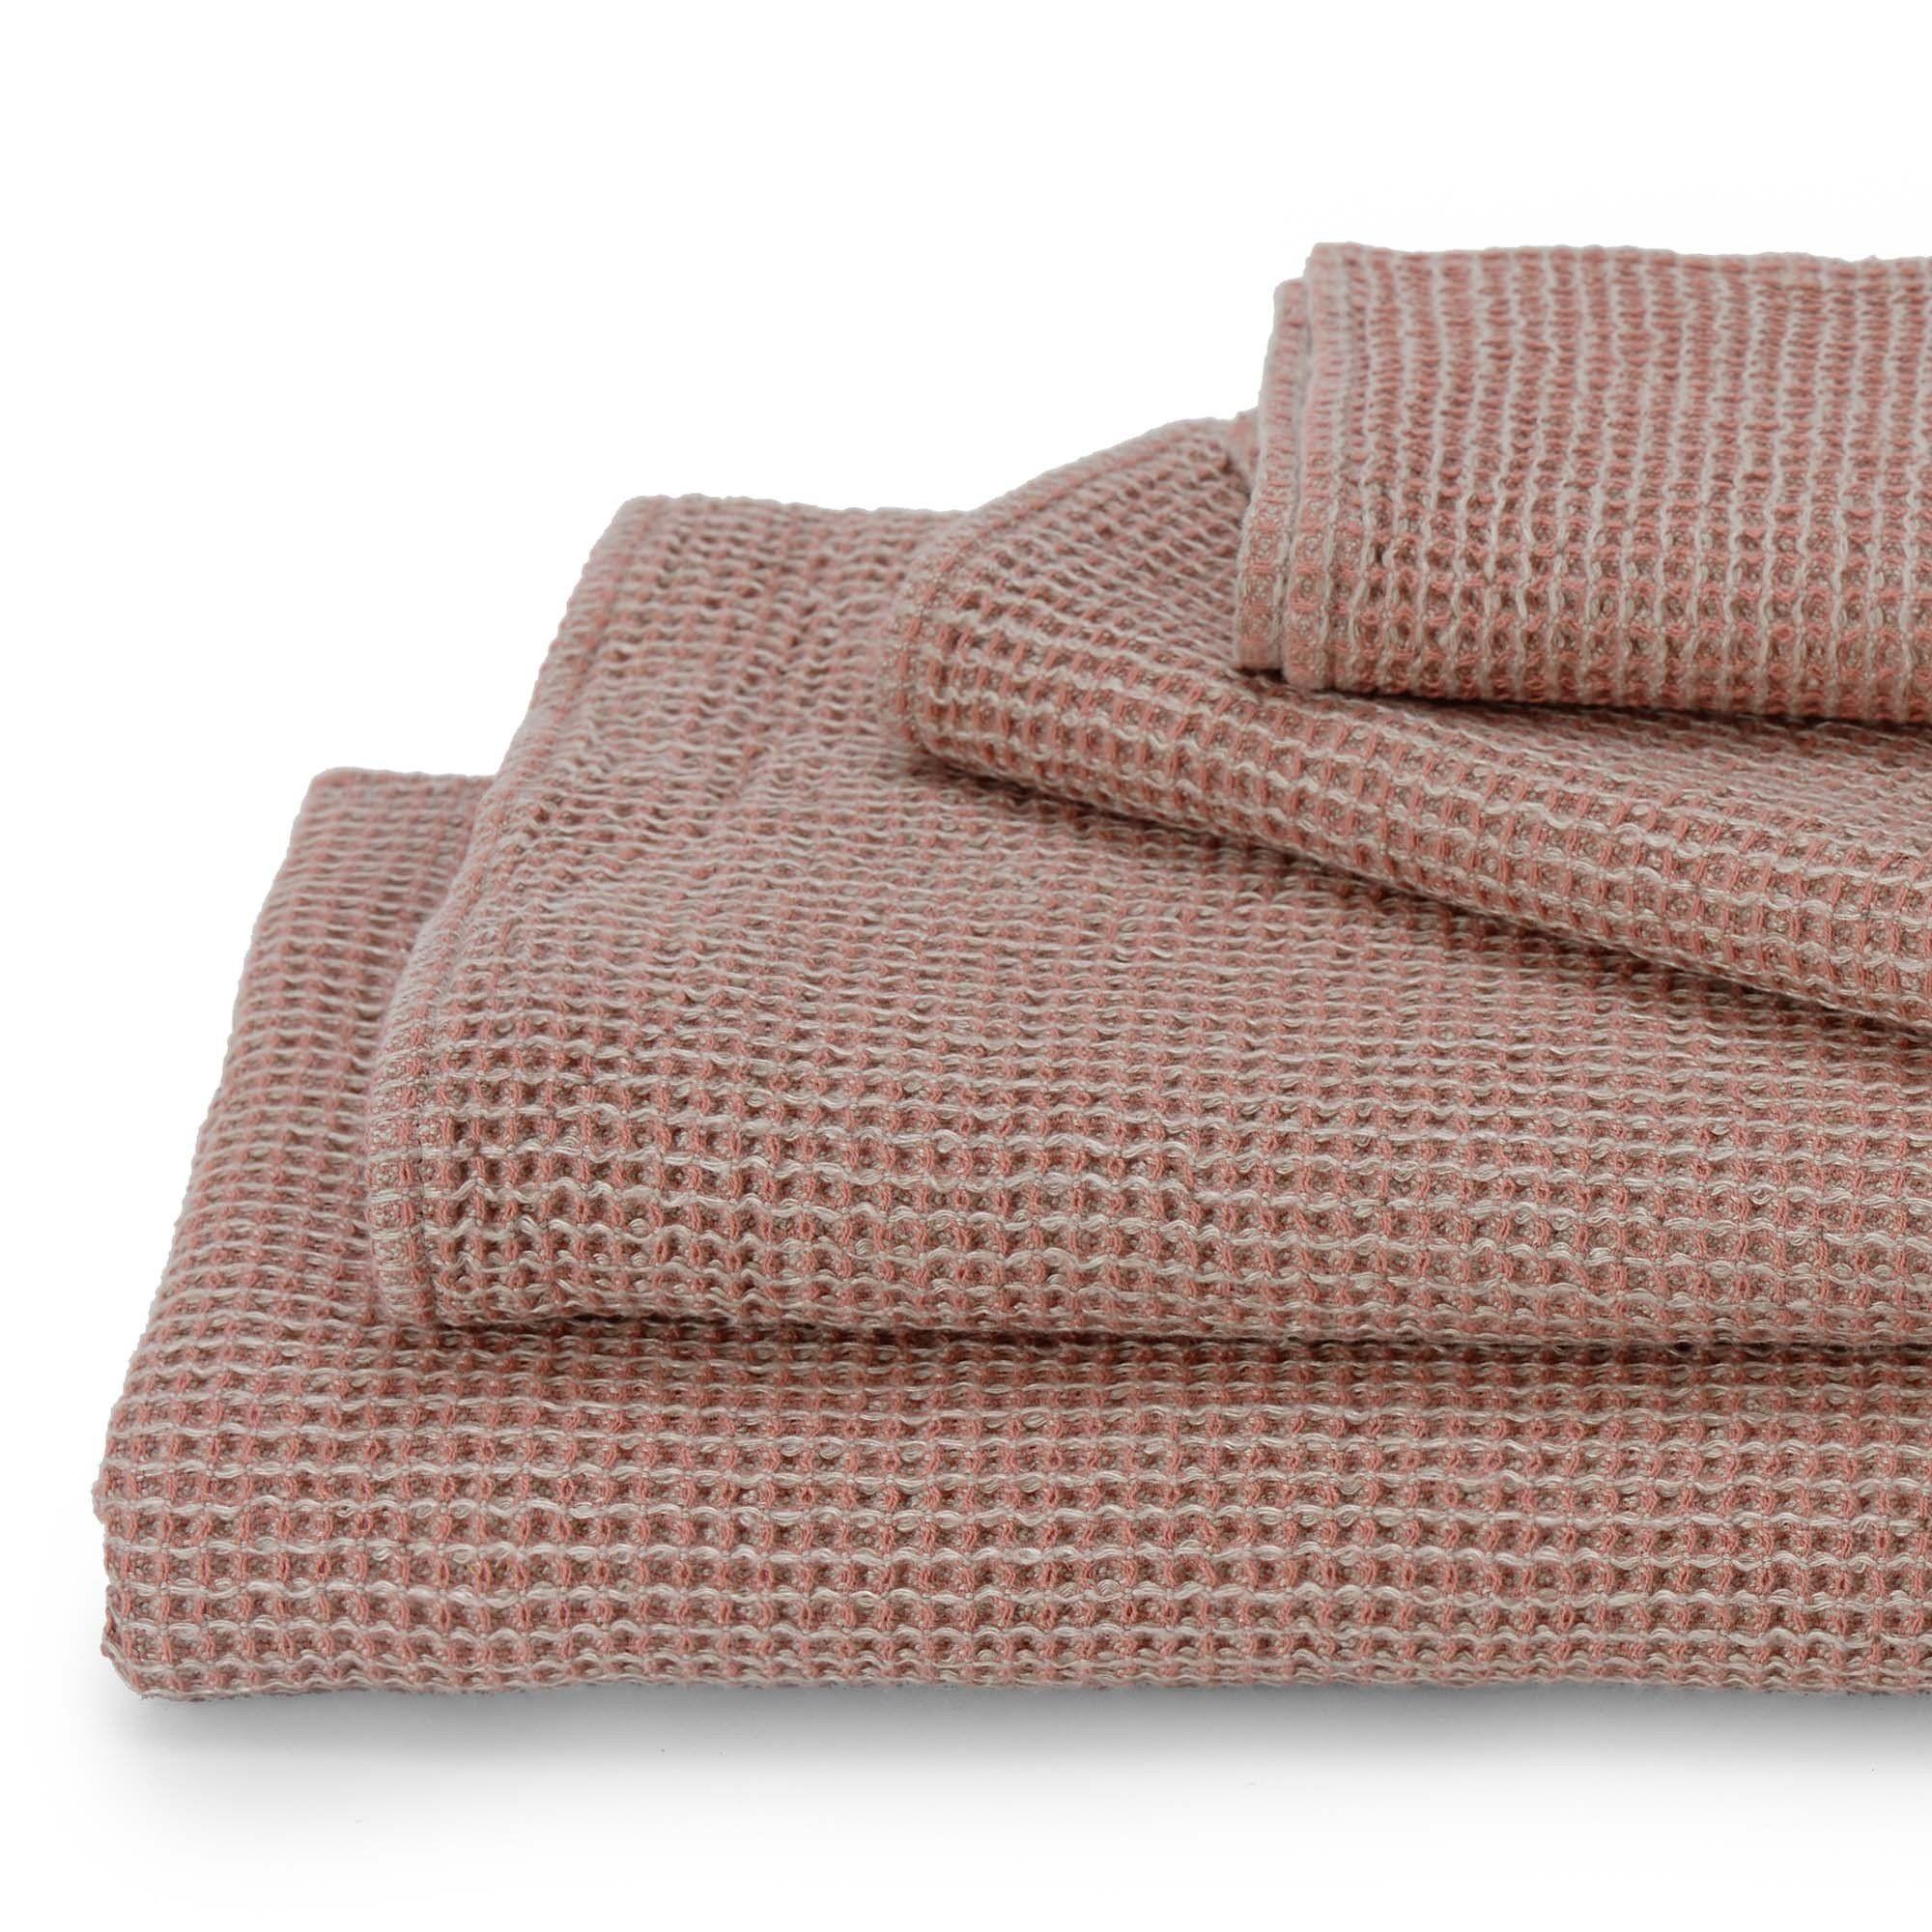 Gastehandtuch Kotra Altrosa Natur Handtuch 50x65 Cm Handtucher Altrosa Und Handtucher Set